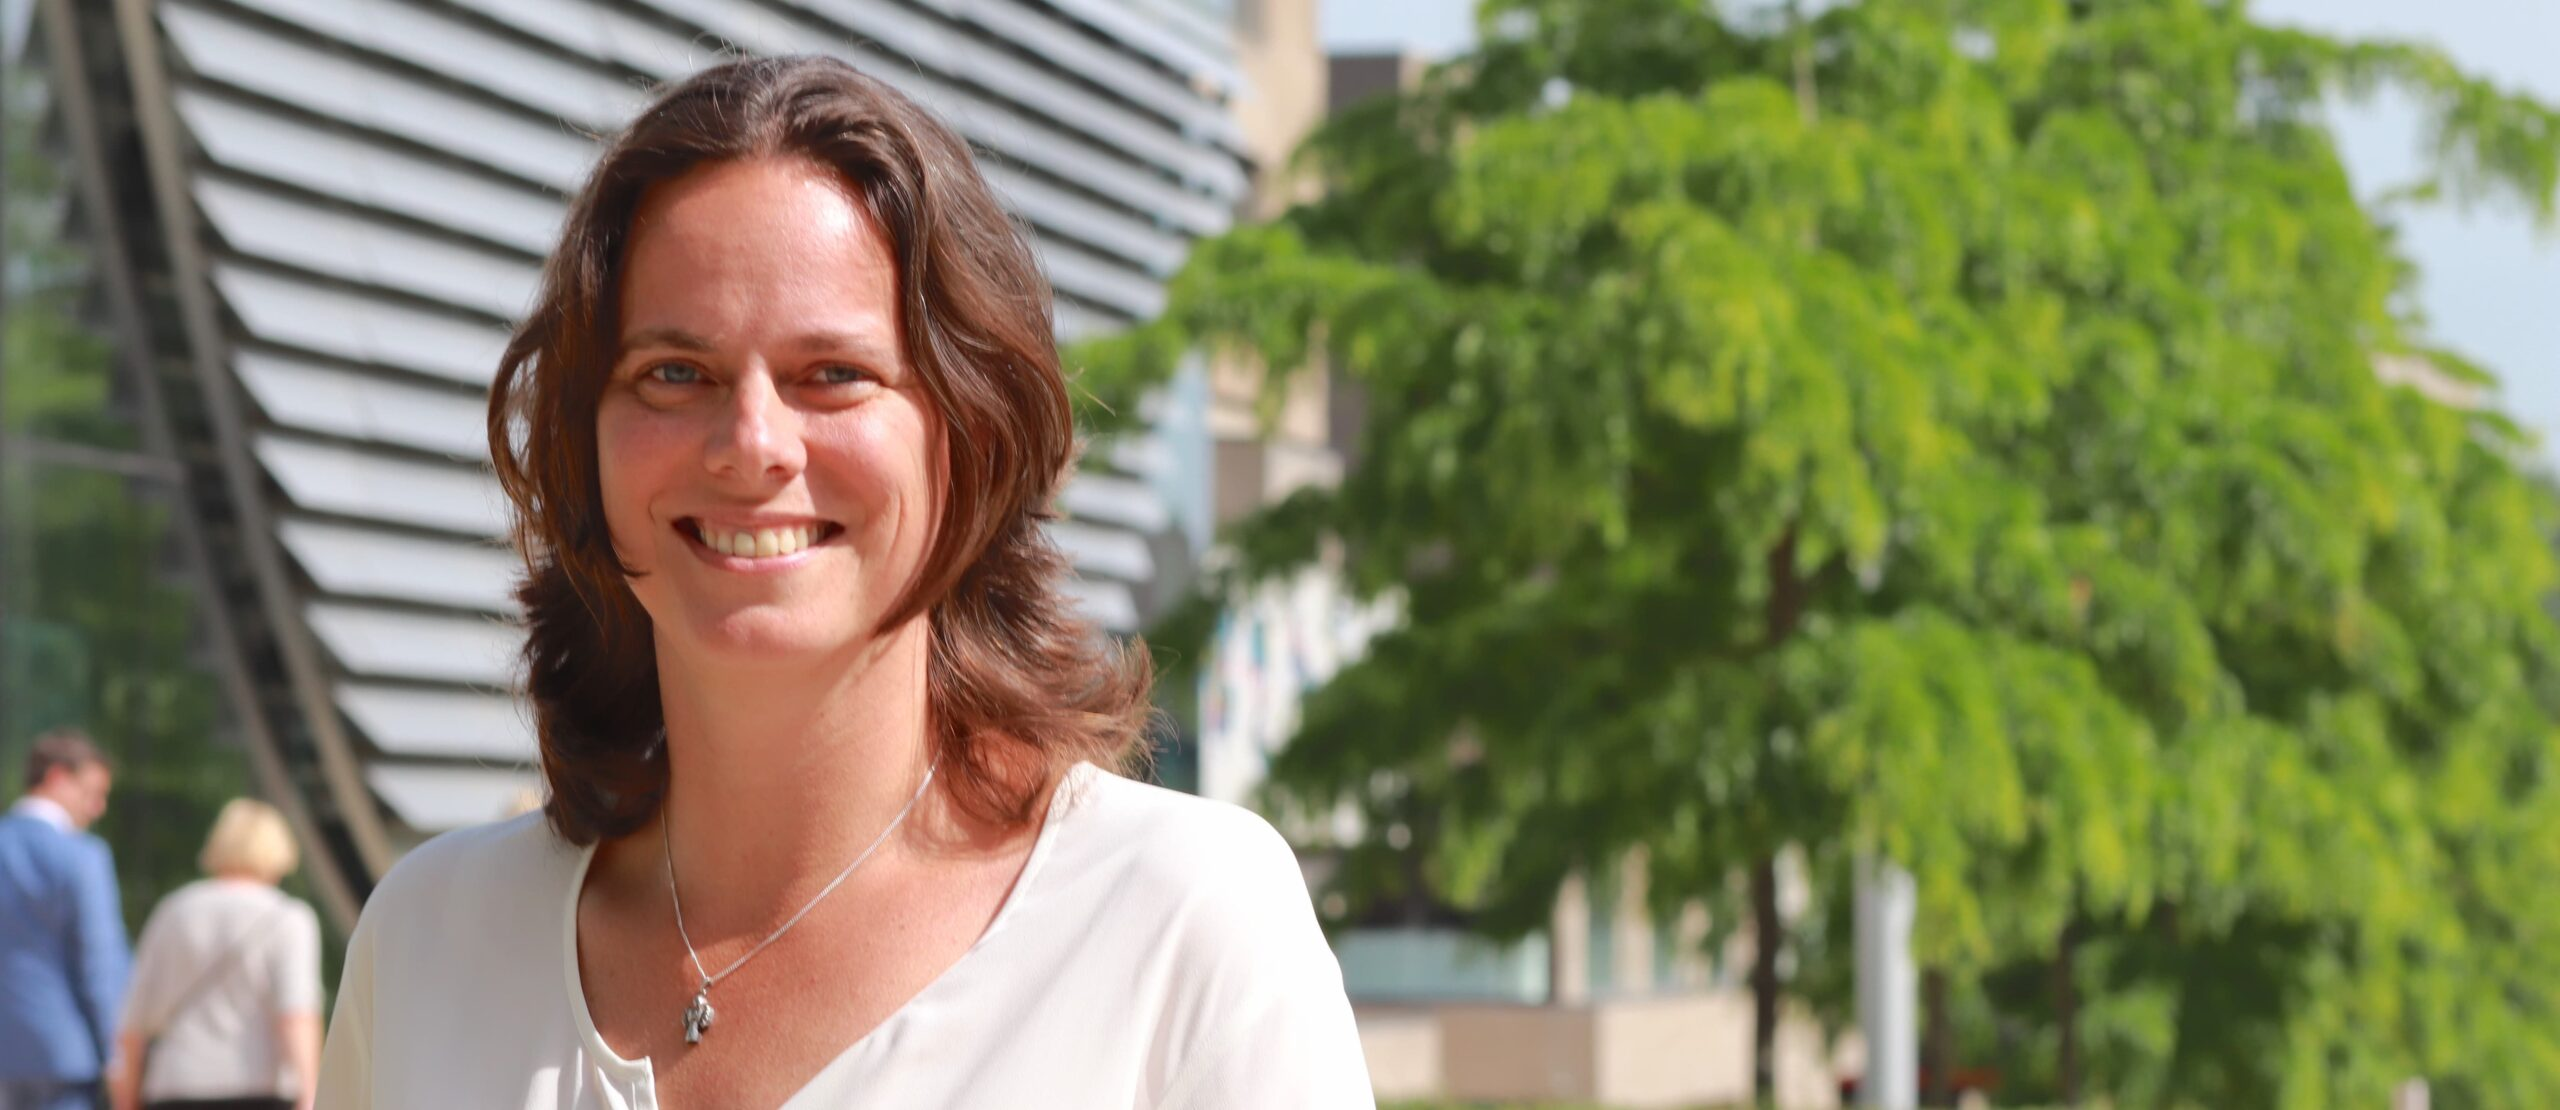 Christa van der Kruk, Marketing & Communicatie adviseur